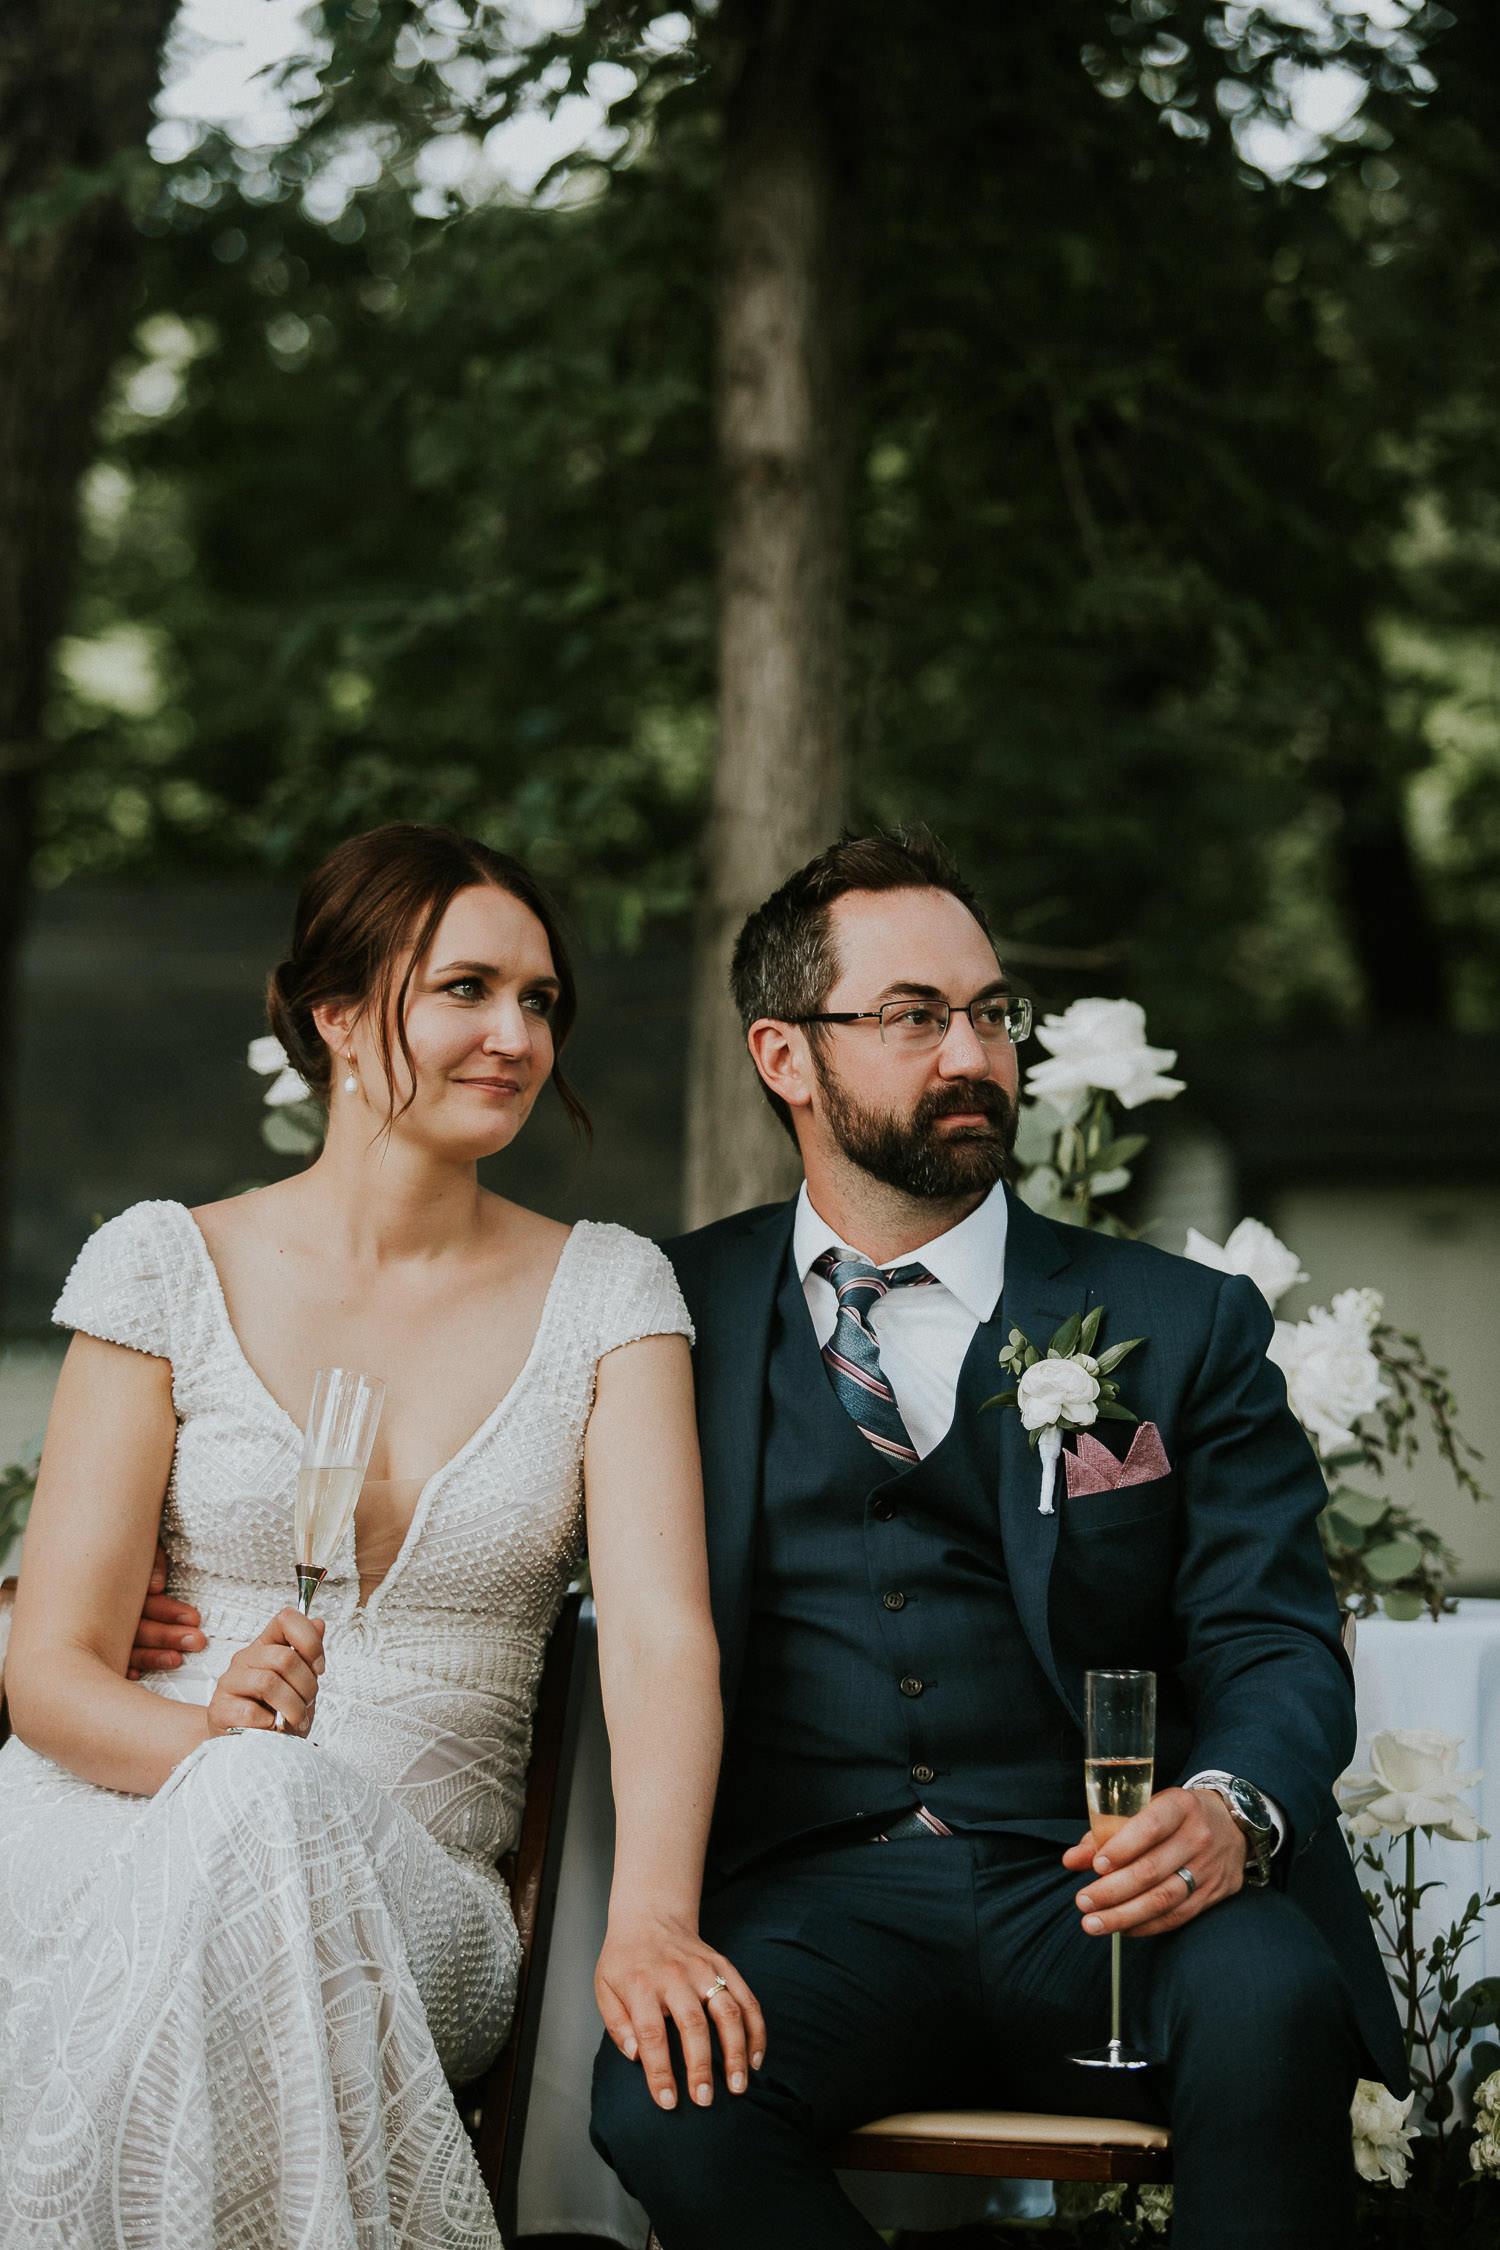 summer-backyard-wedding-in-alberta-sarah-pukin-0153